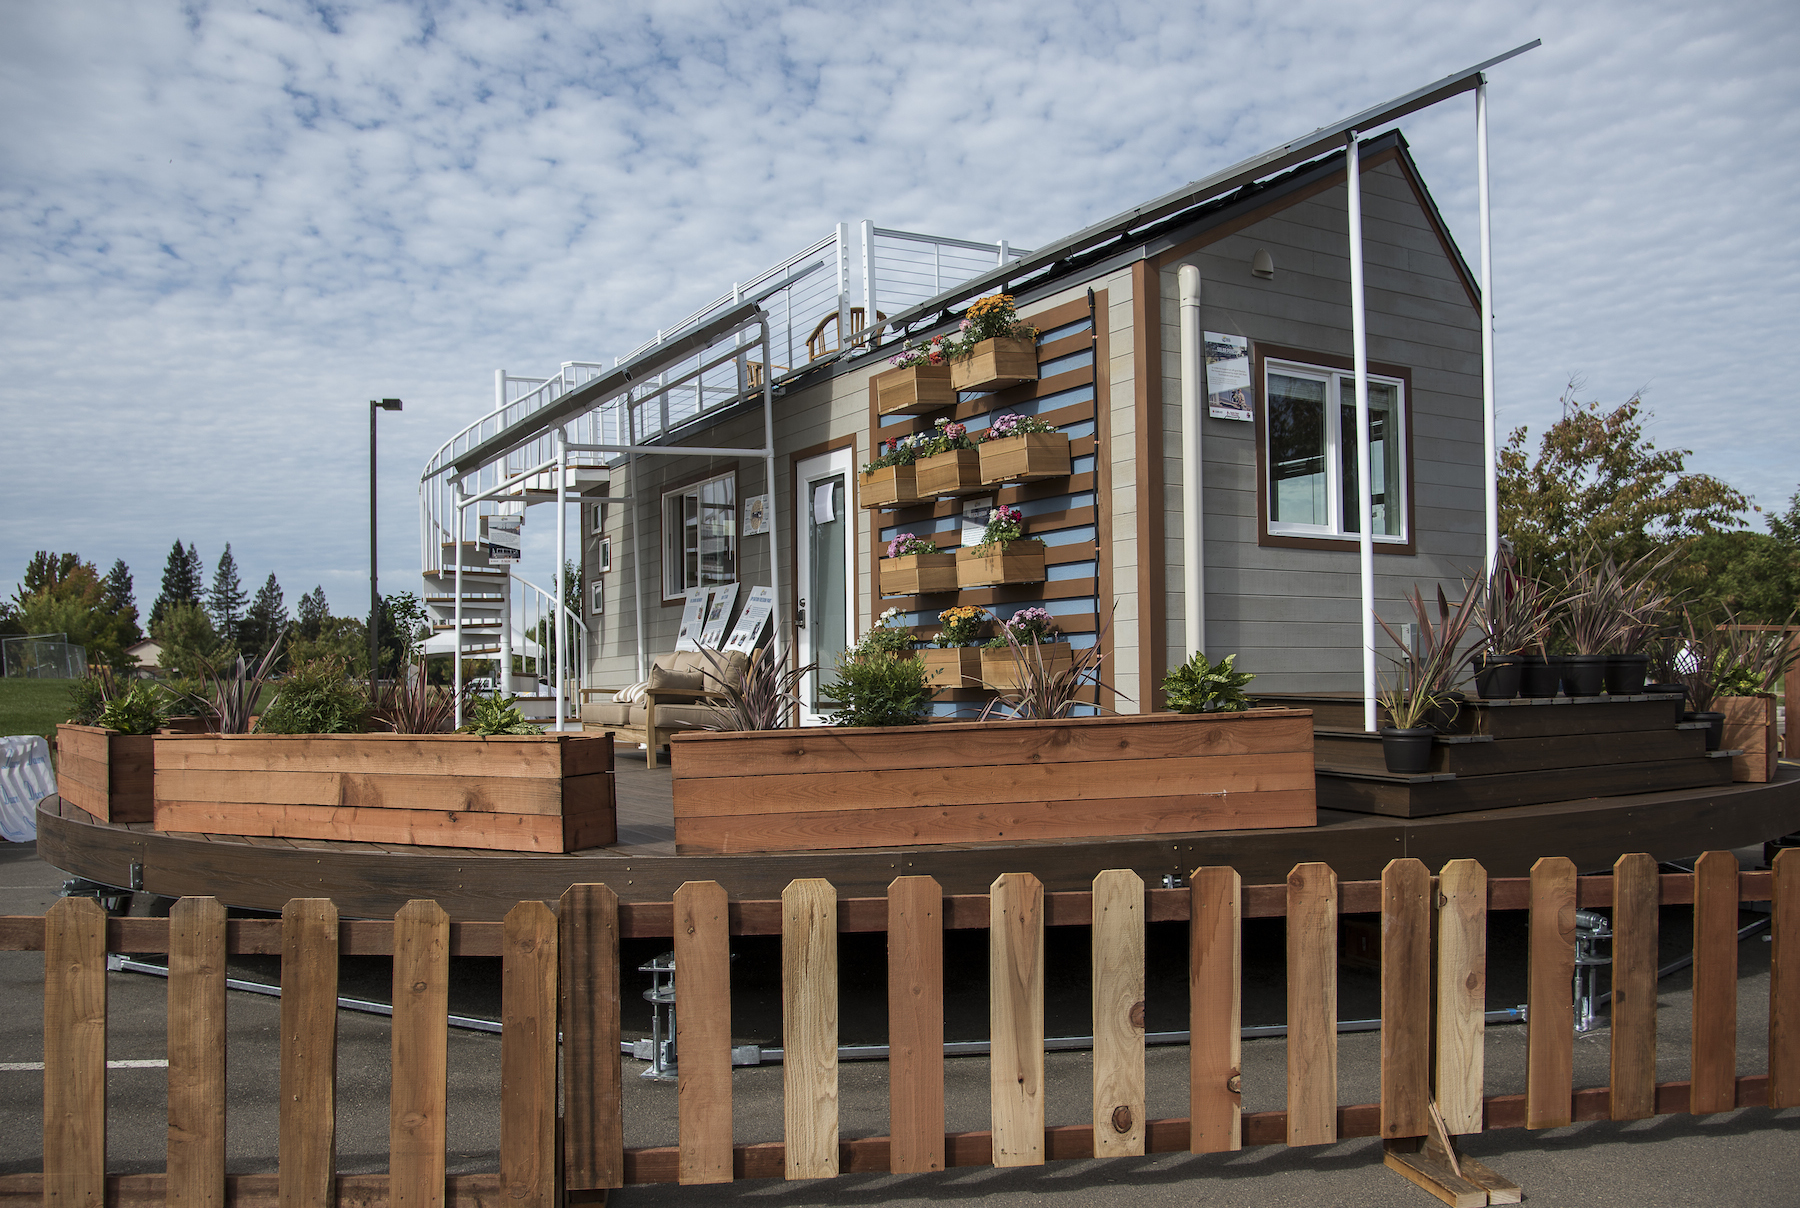 Tiny house with solar panels